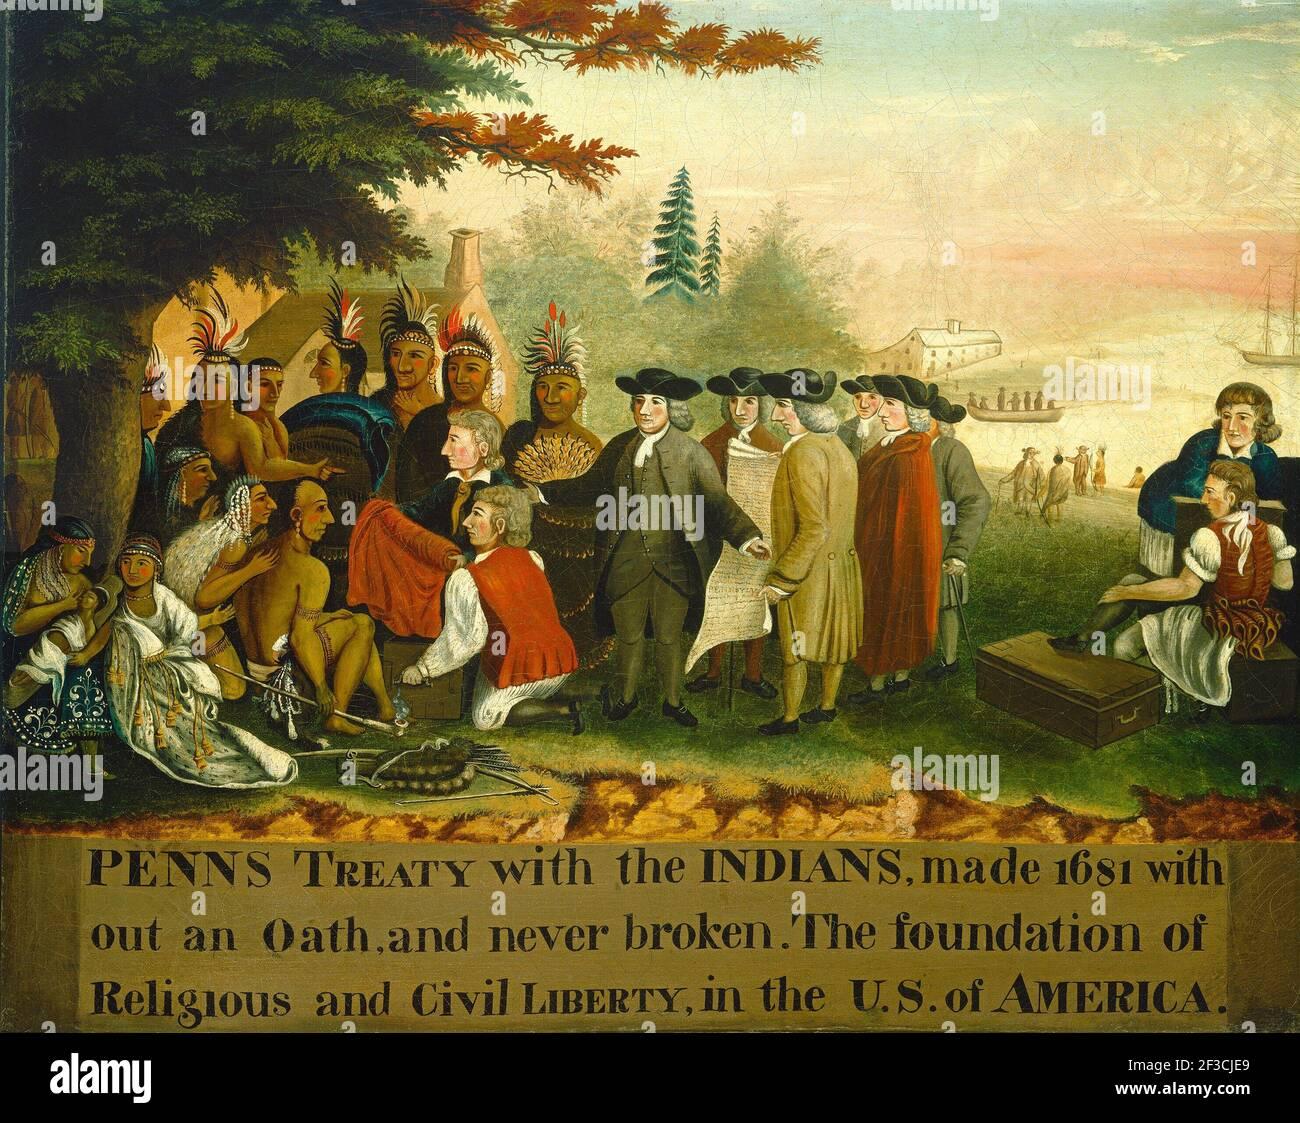 Penn's Treaty with the Indians, c. 1840/1844. Stock Photo